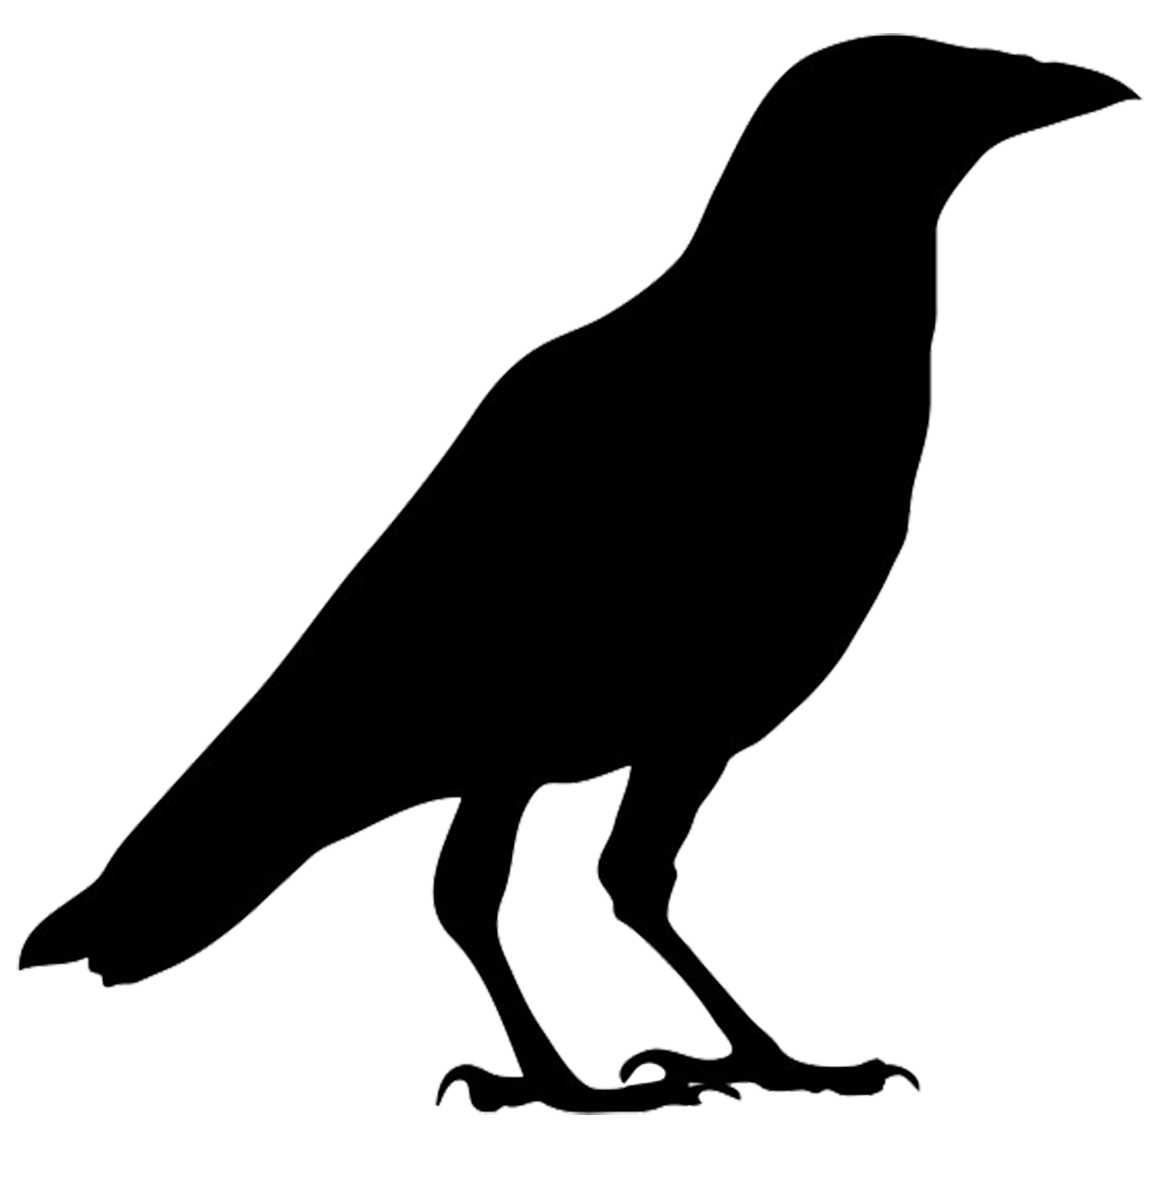 Crow Silhouette Crow Silhouette Silhouette Art Bird Silhouette